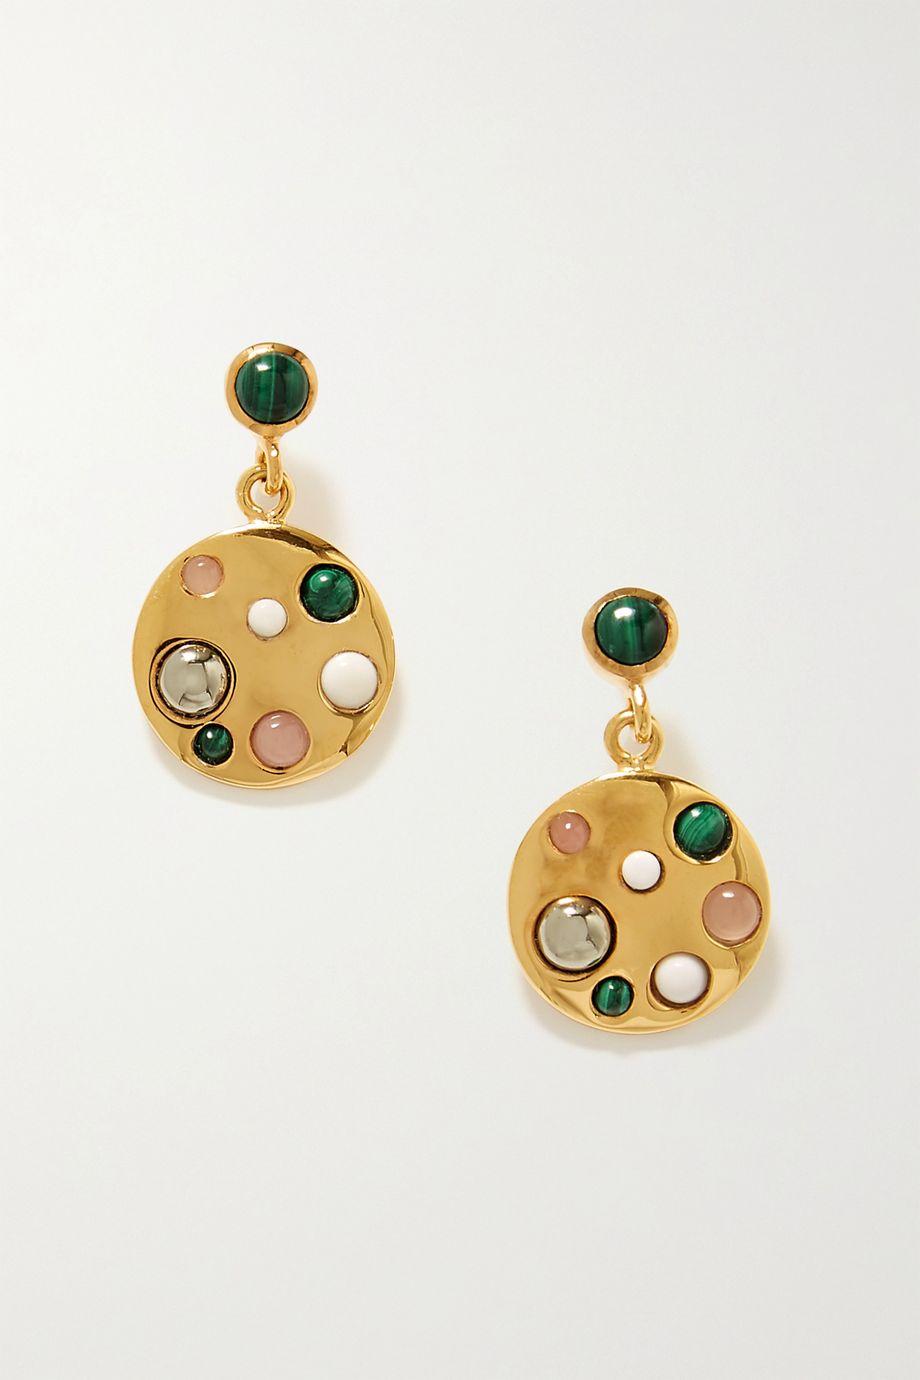 Rasa x Anna Beck Gold-plated multi-stone earrings